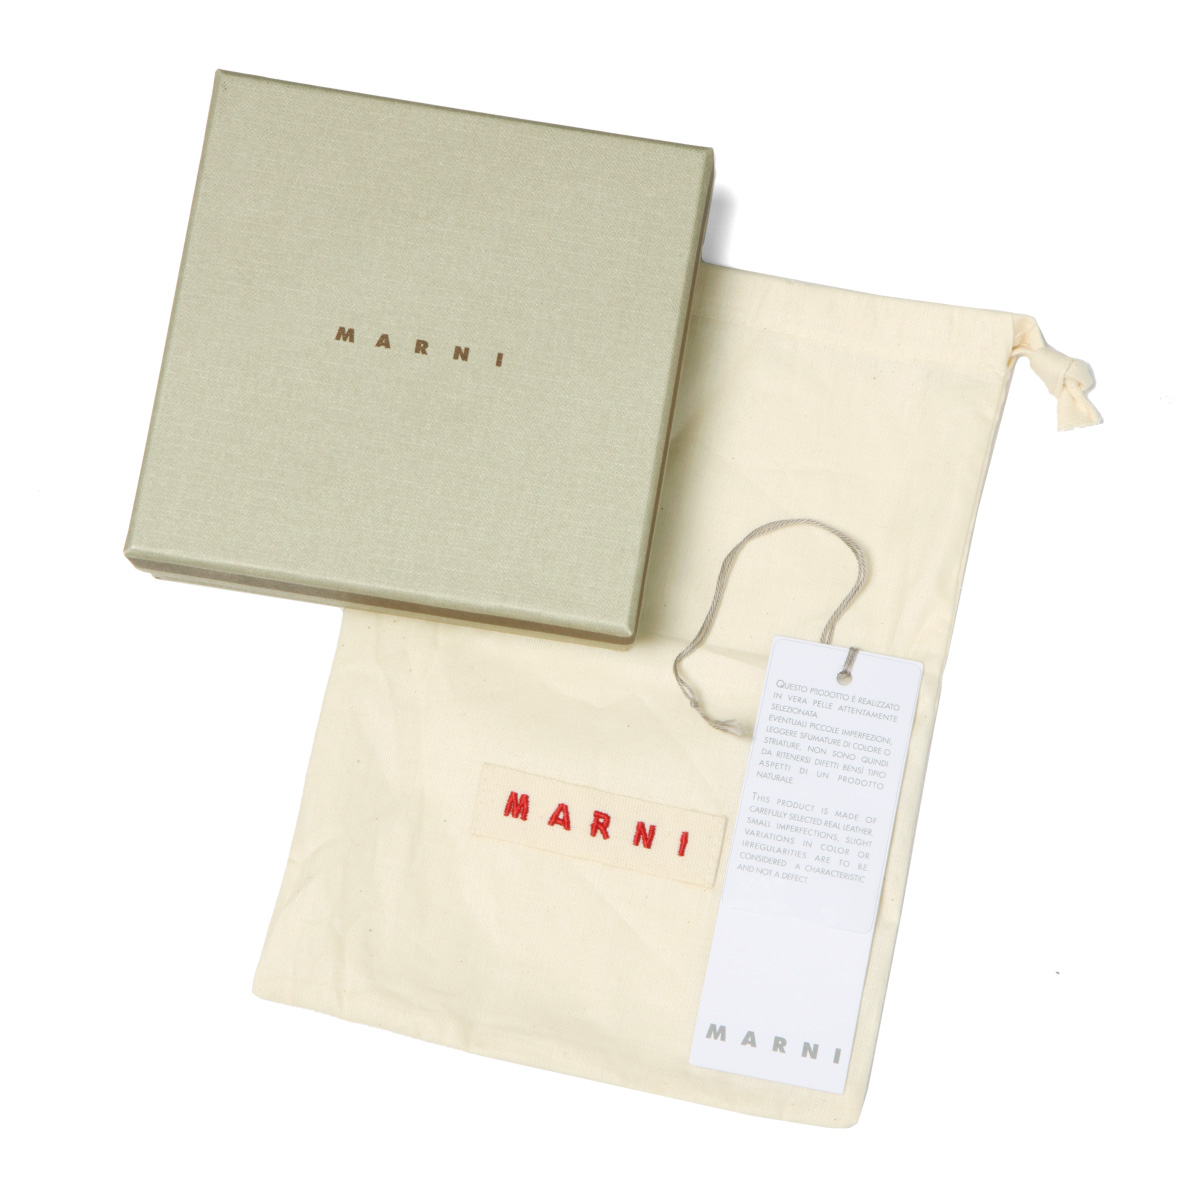 MARNI マルニ | ラウンドファスナー二つ折り財布